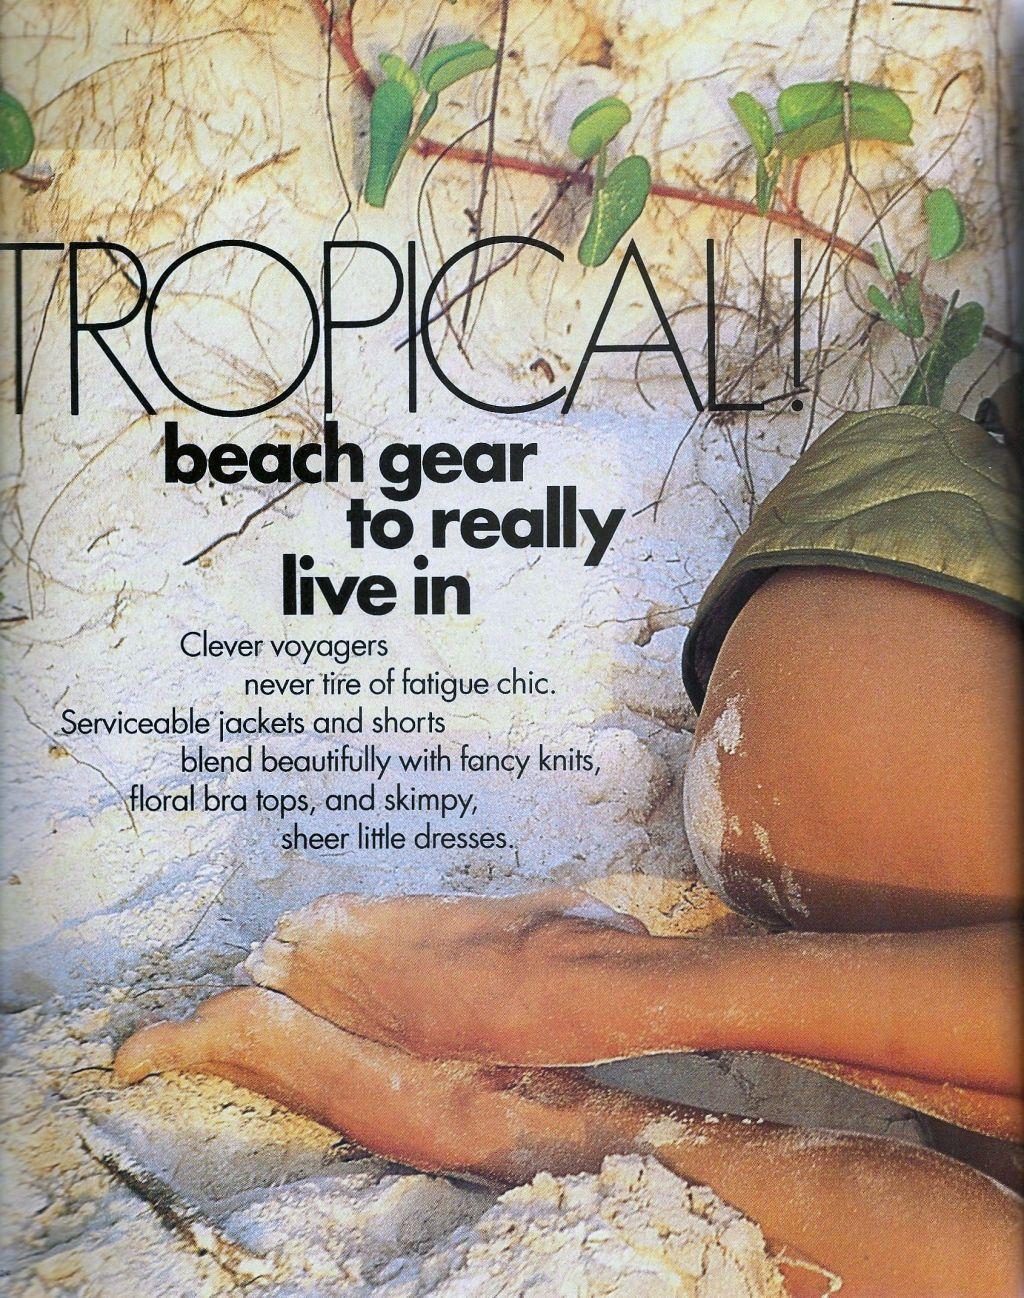 Elle (US) January 1991 | Tropical 01.jpg